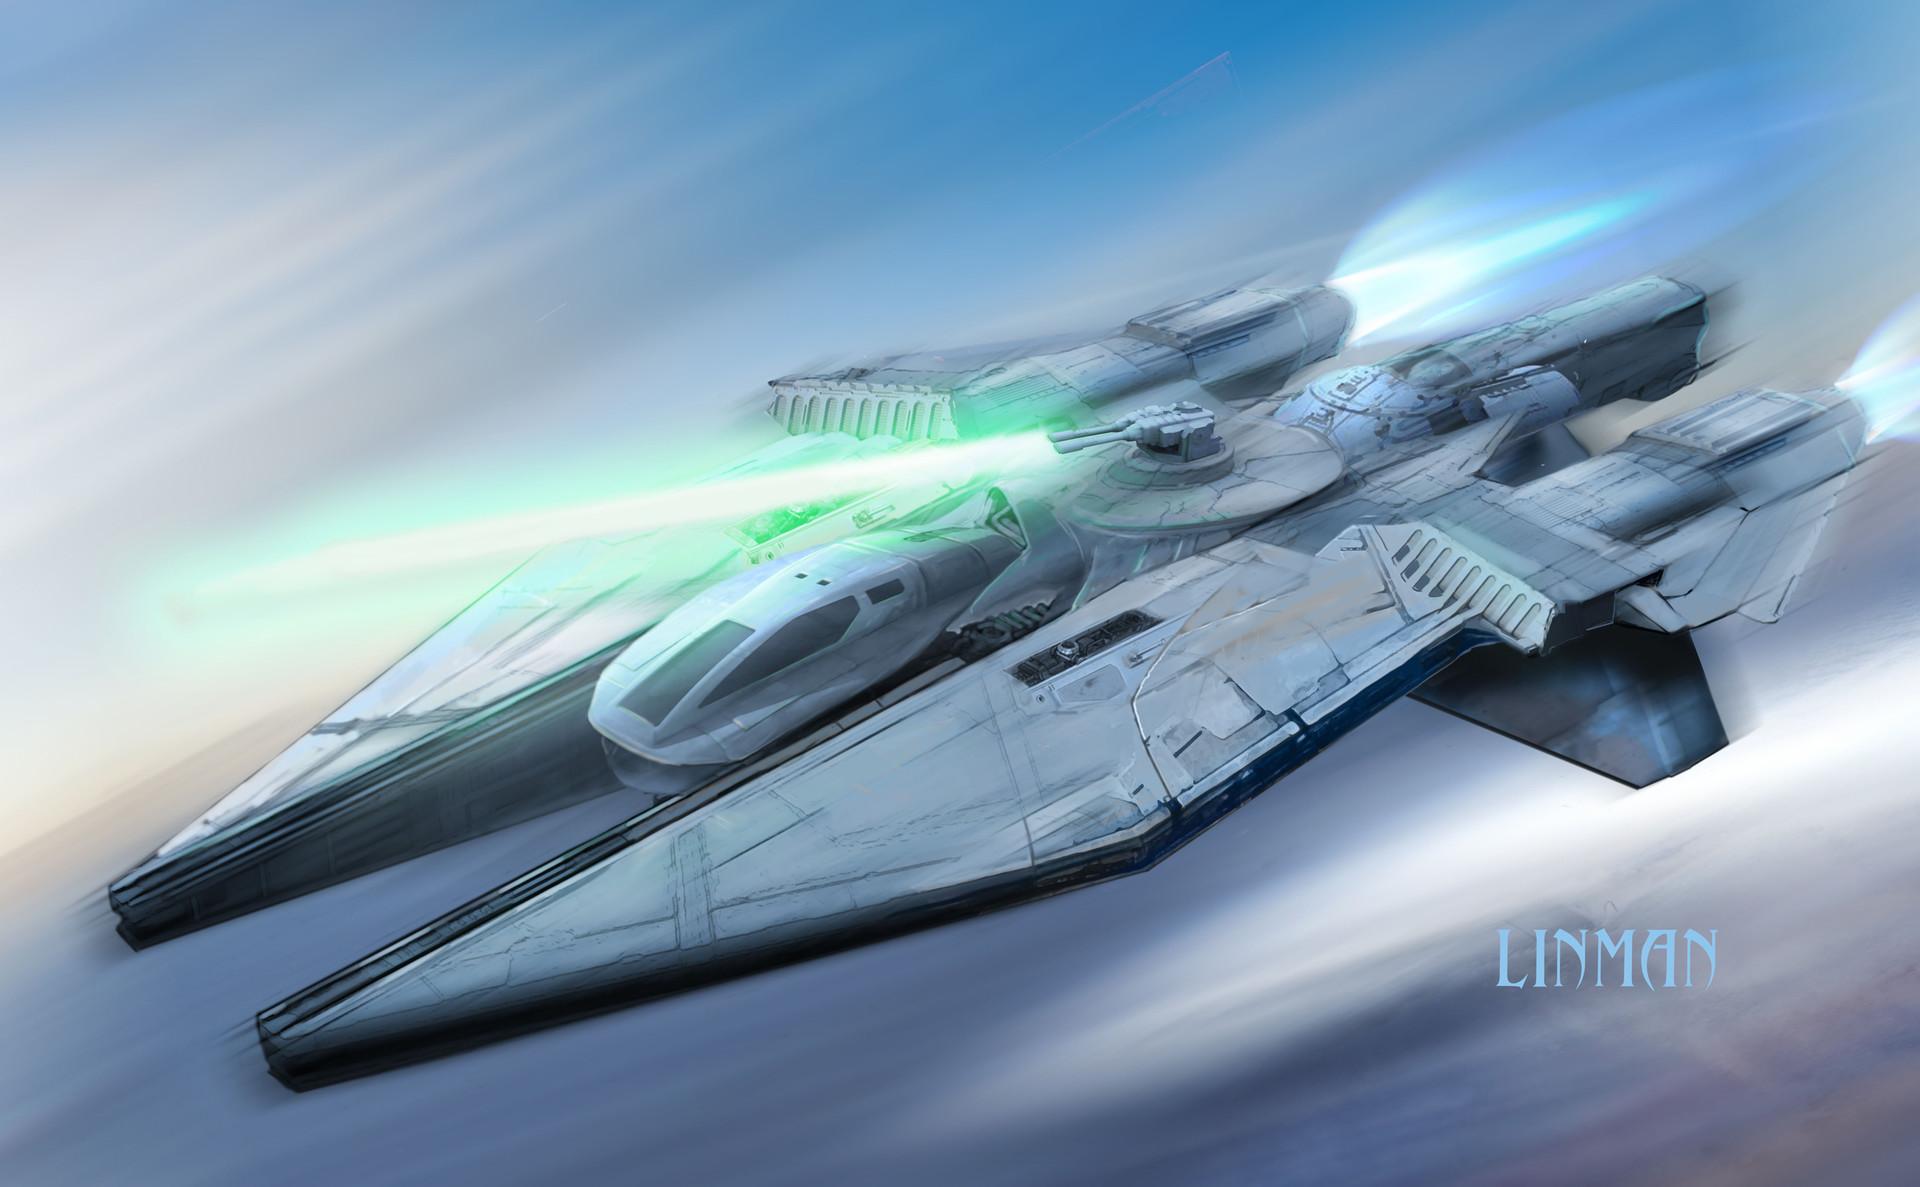 Michael linman starwarsvehicleconceptweb